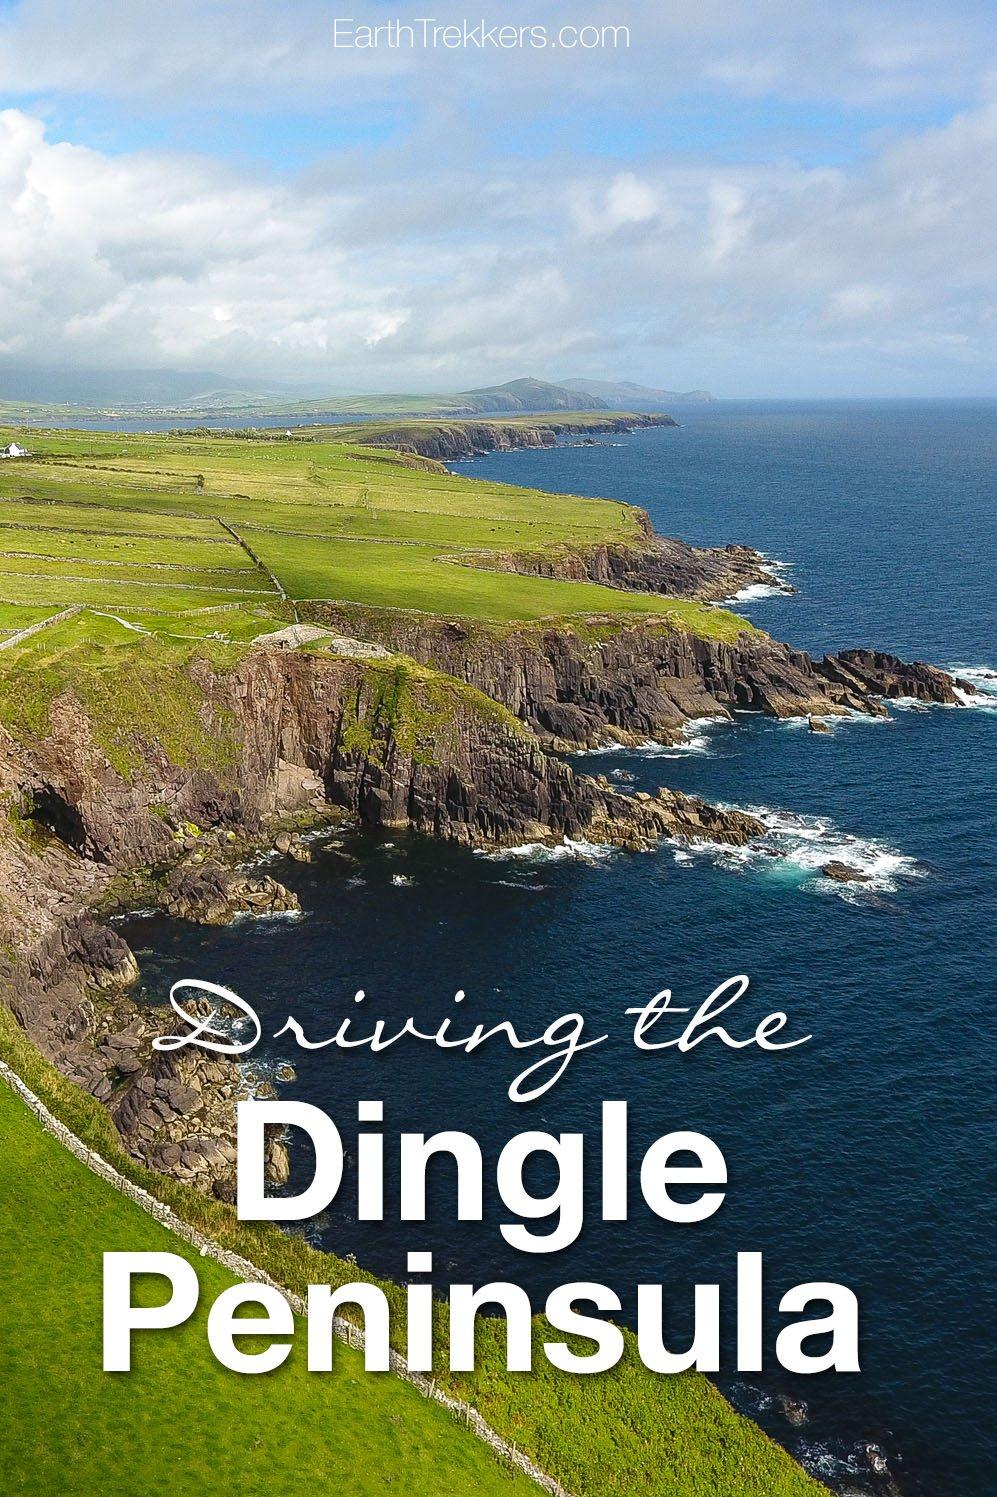 Slea Head Drive Dingle Peninsula Ireland